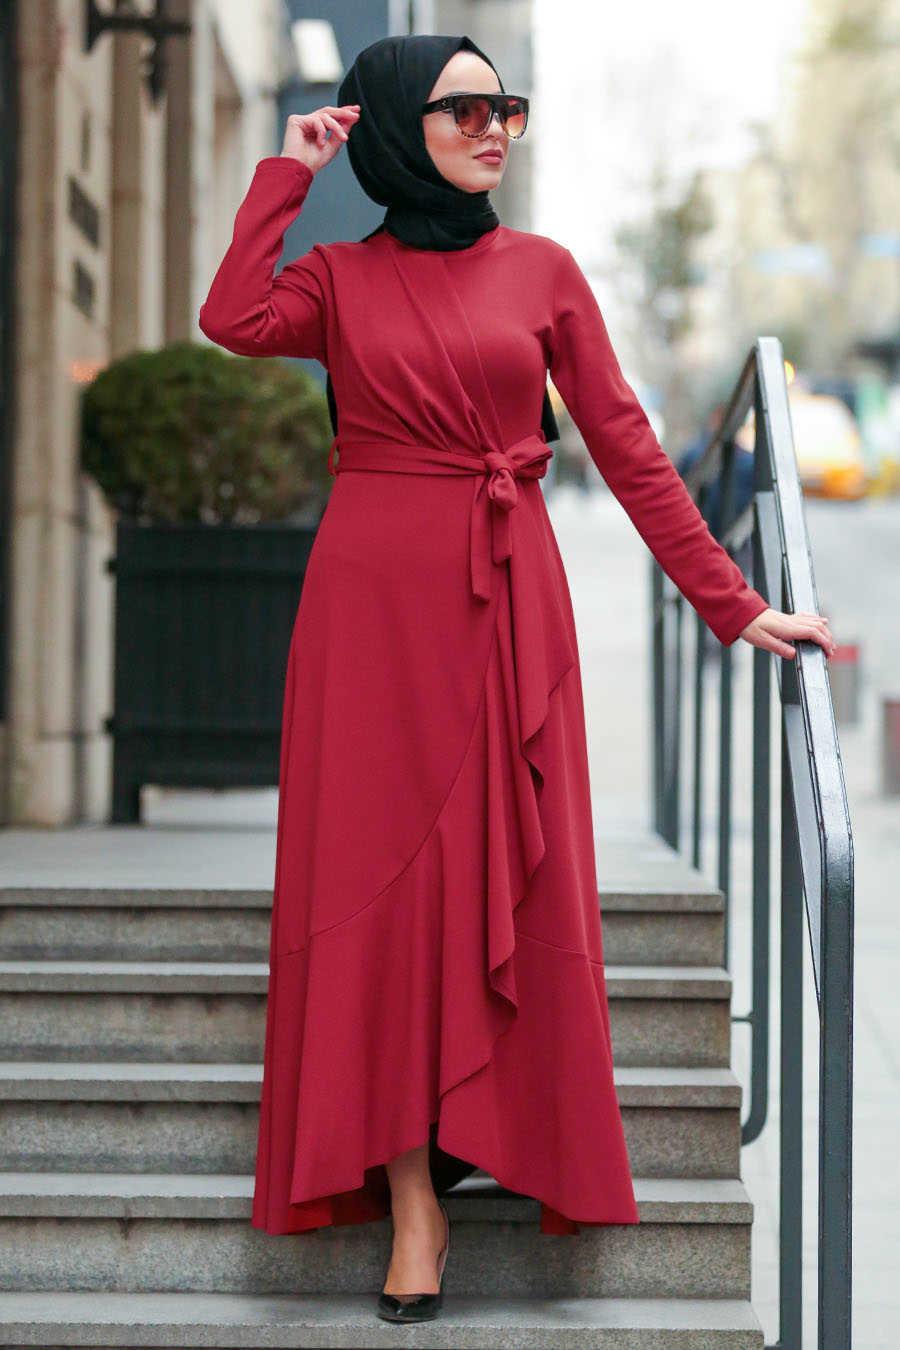 Neva Style - Claret Red Hijab Dress 4041BR